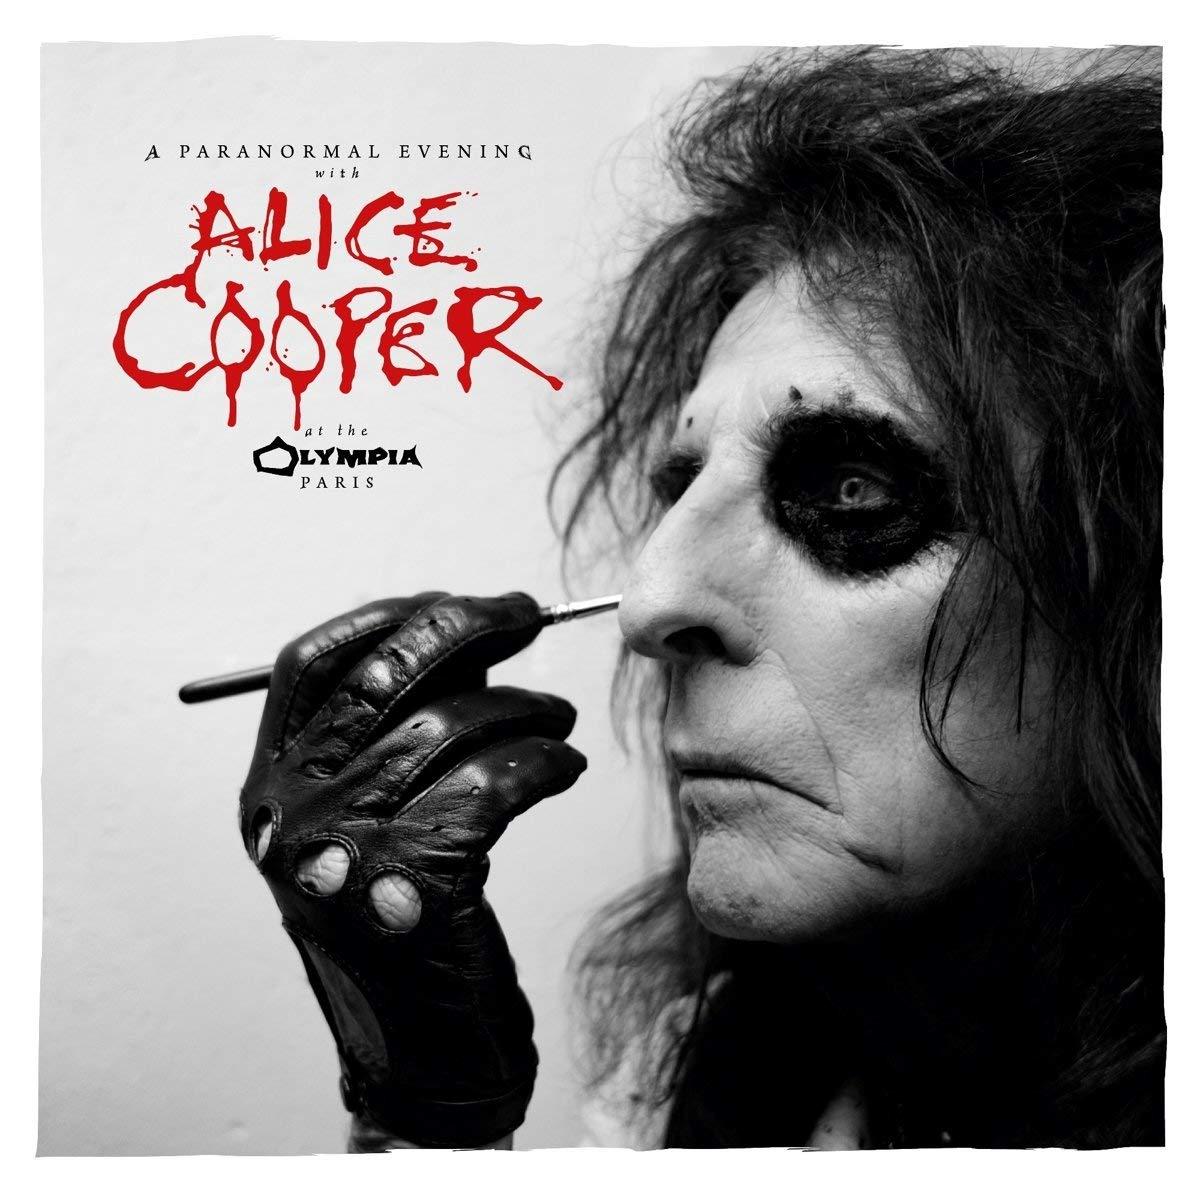 Элис Купер Alice Cooper. A Paranormal Evening At The Olympia Paris (2 LP) элис купер alice cooper killer lp